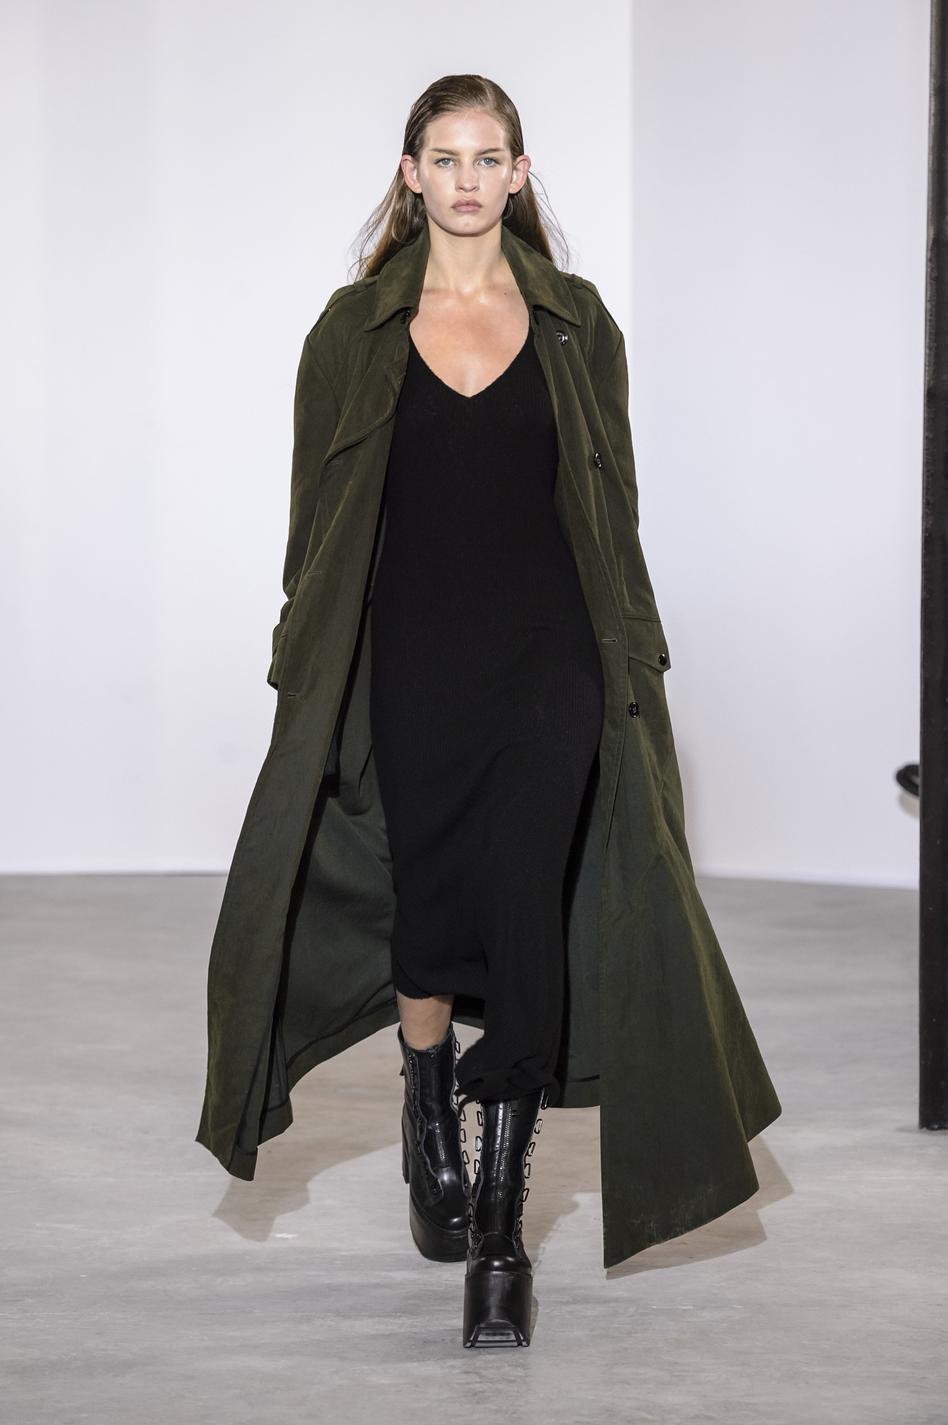 AW 2018-19 fashion week inspirations | Dress like a parisian